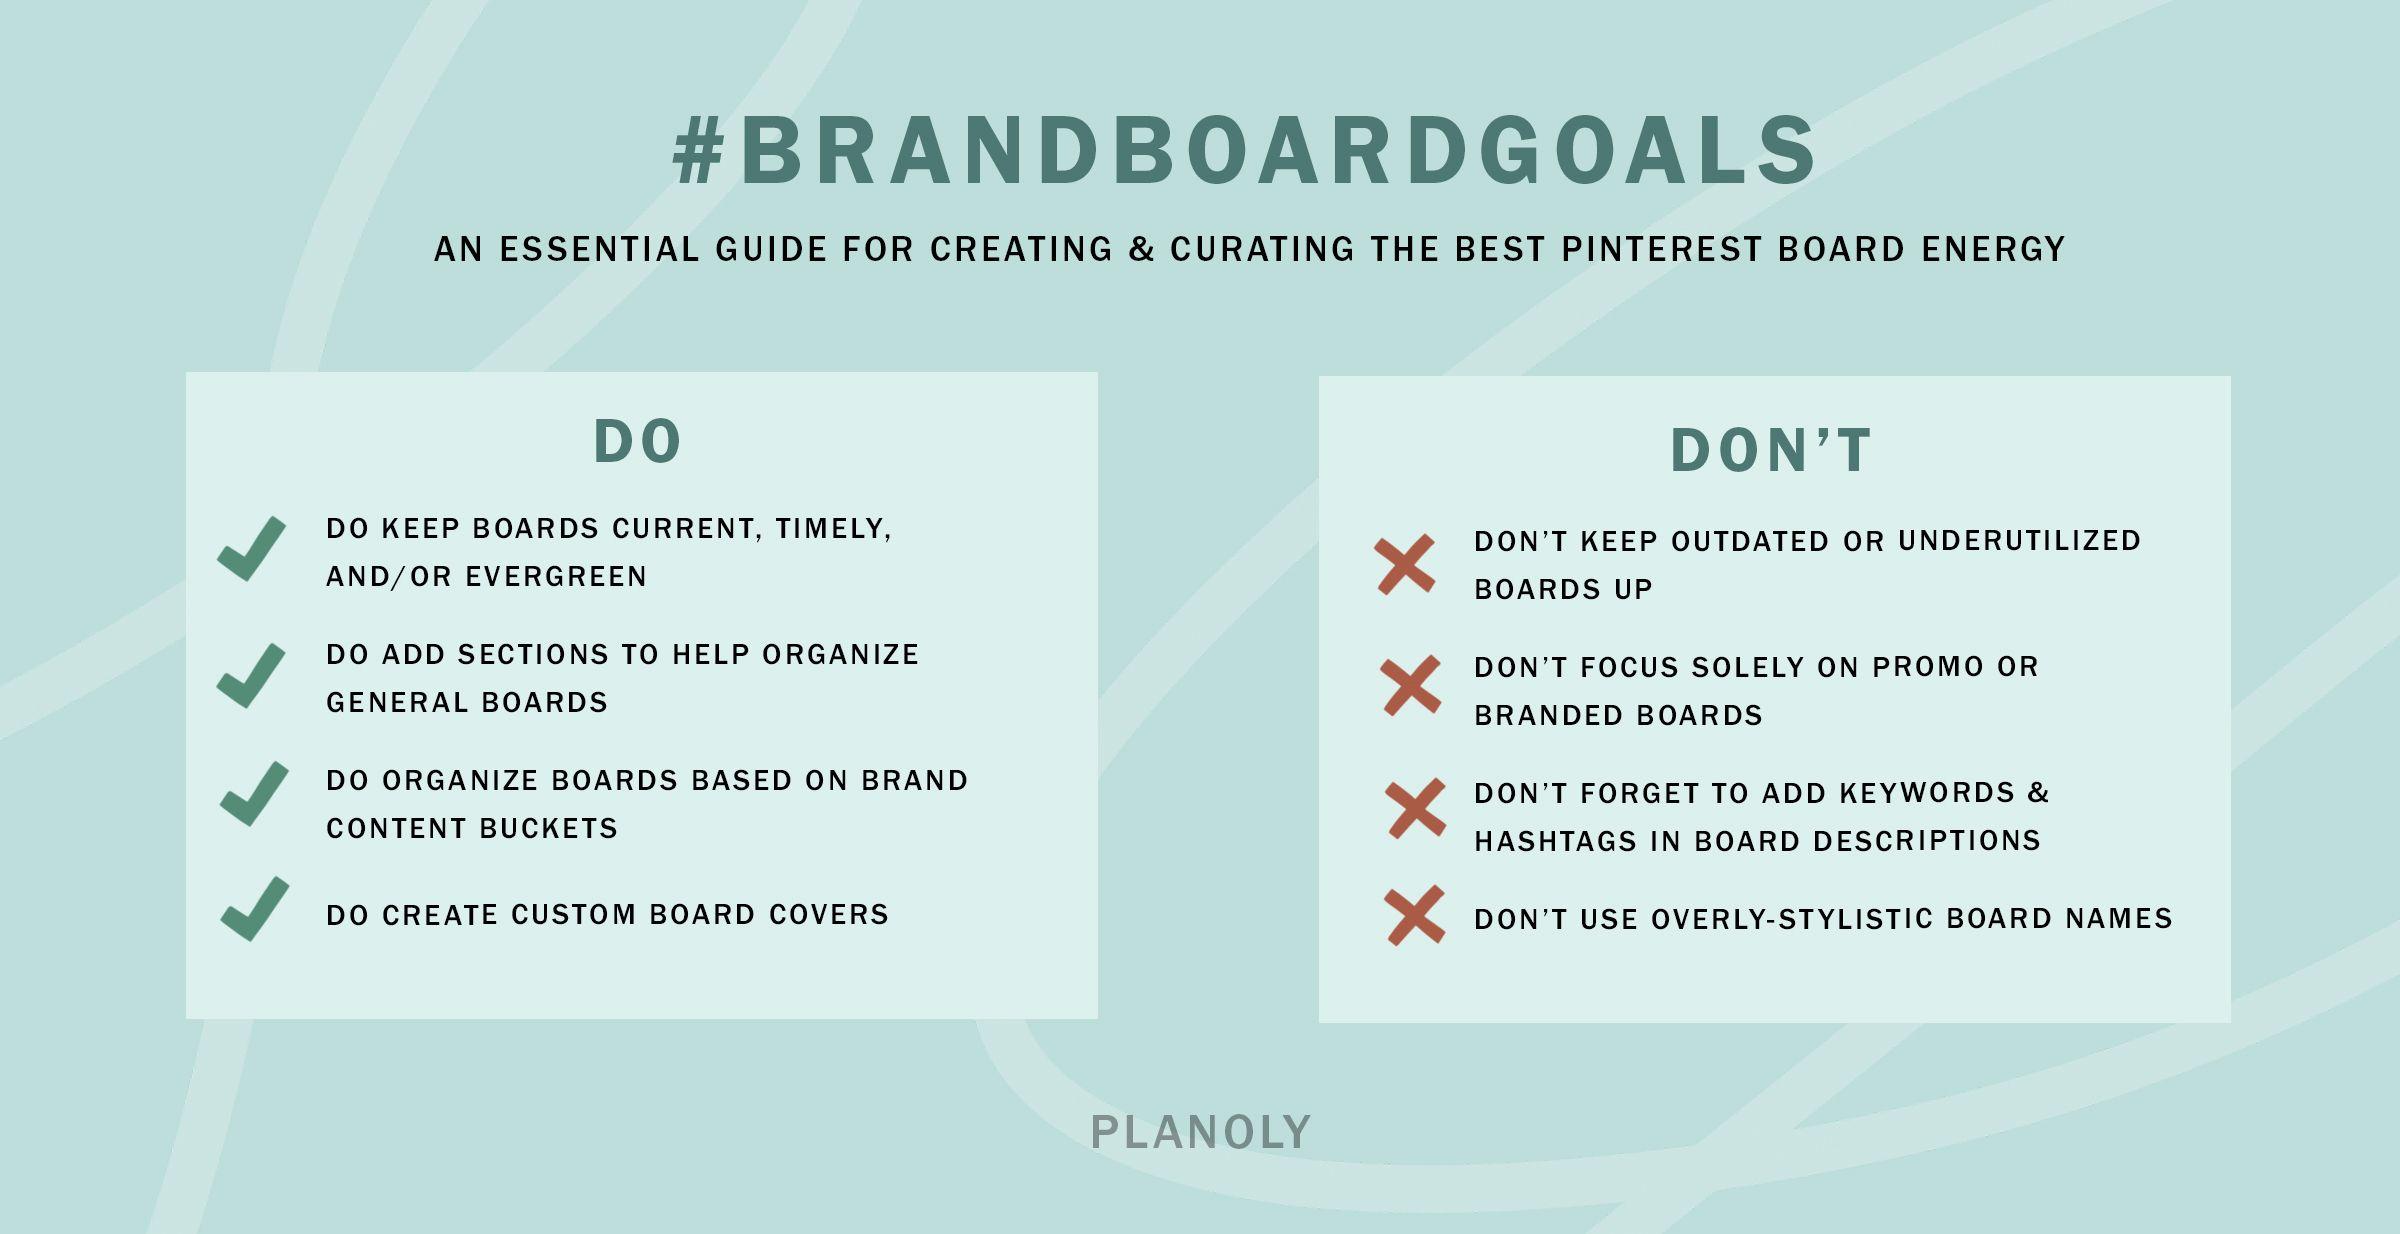 PLANOLY-Blog Post-Pinterest Boards-Image 1